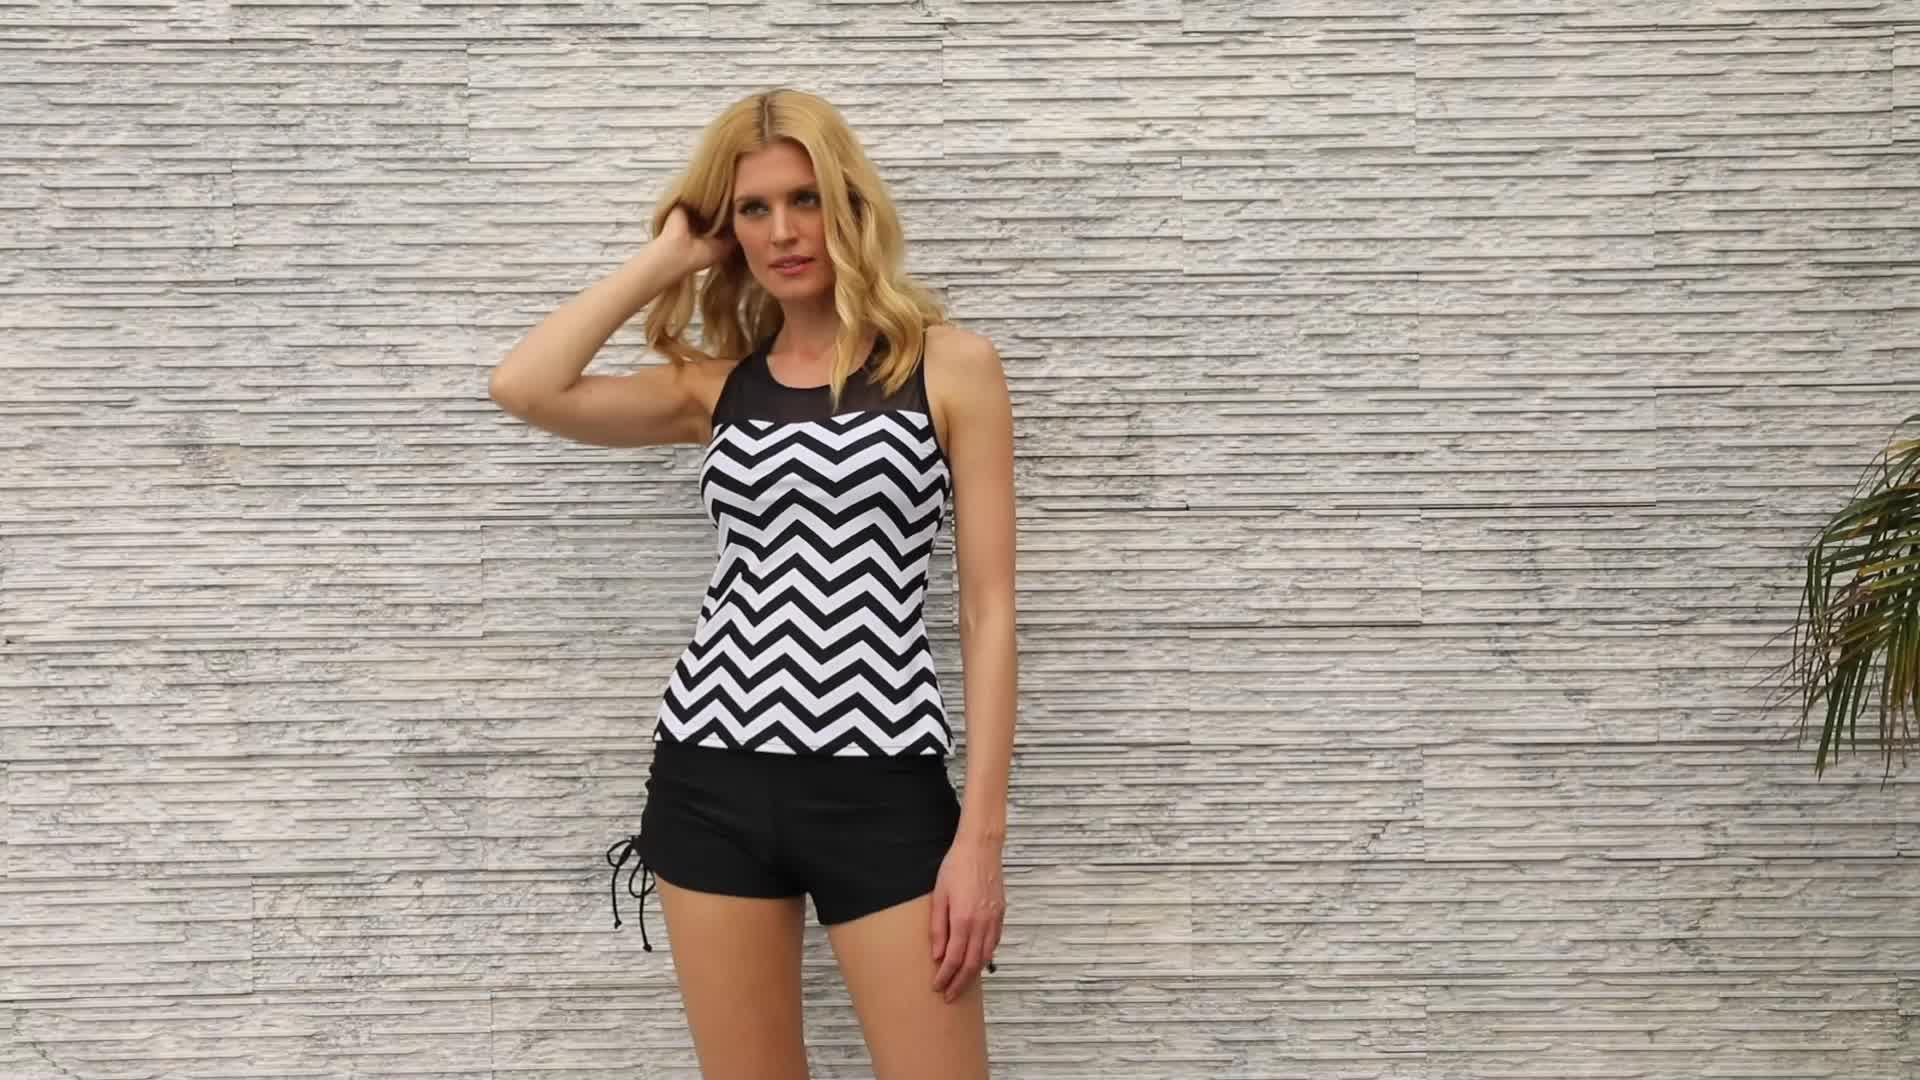 2019 Swimwear Black And White Print Swim Suit Women Swimsuit Tankini Sets